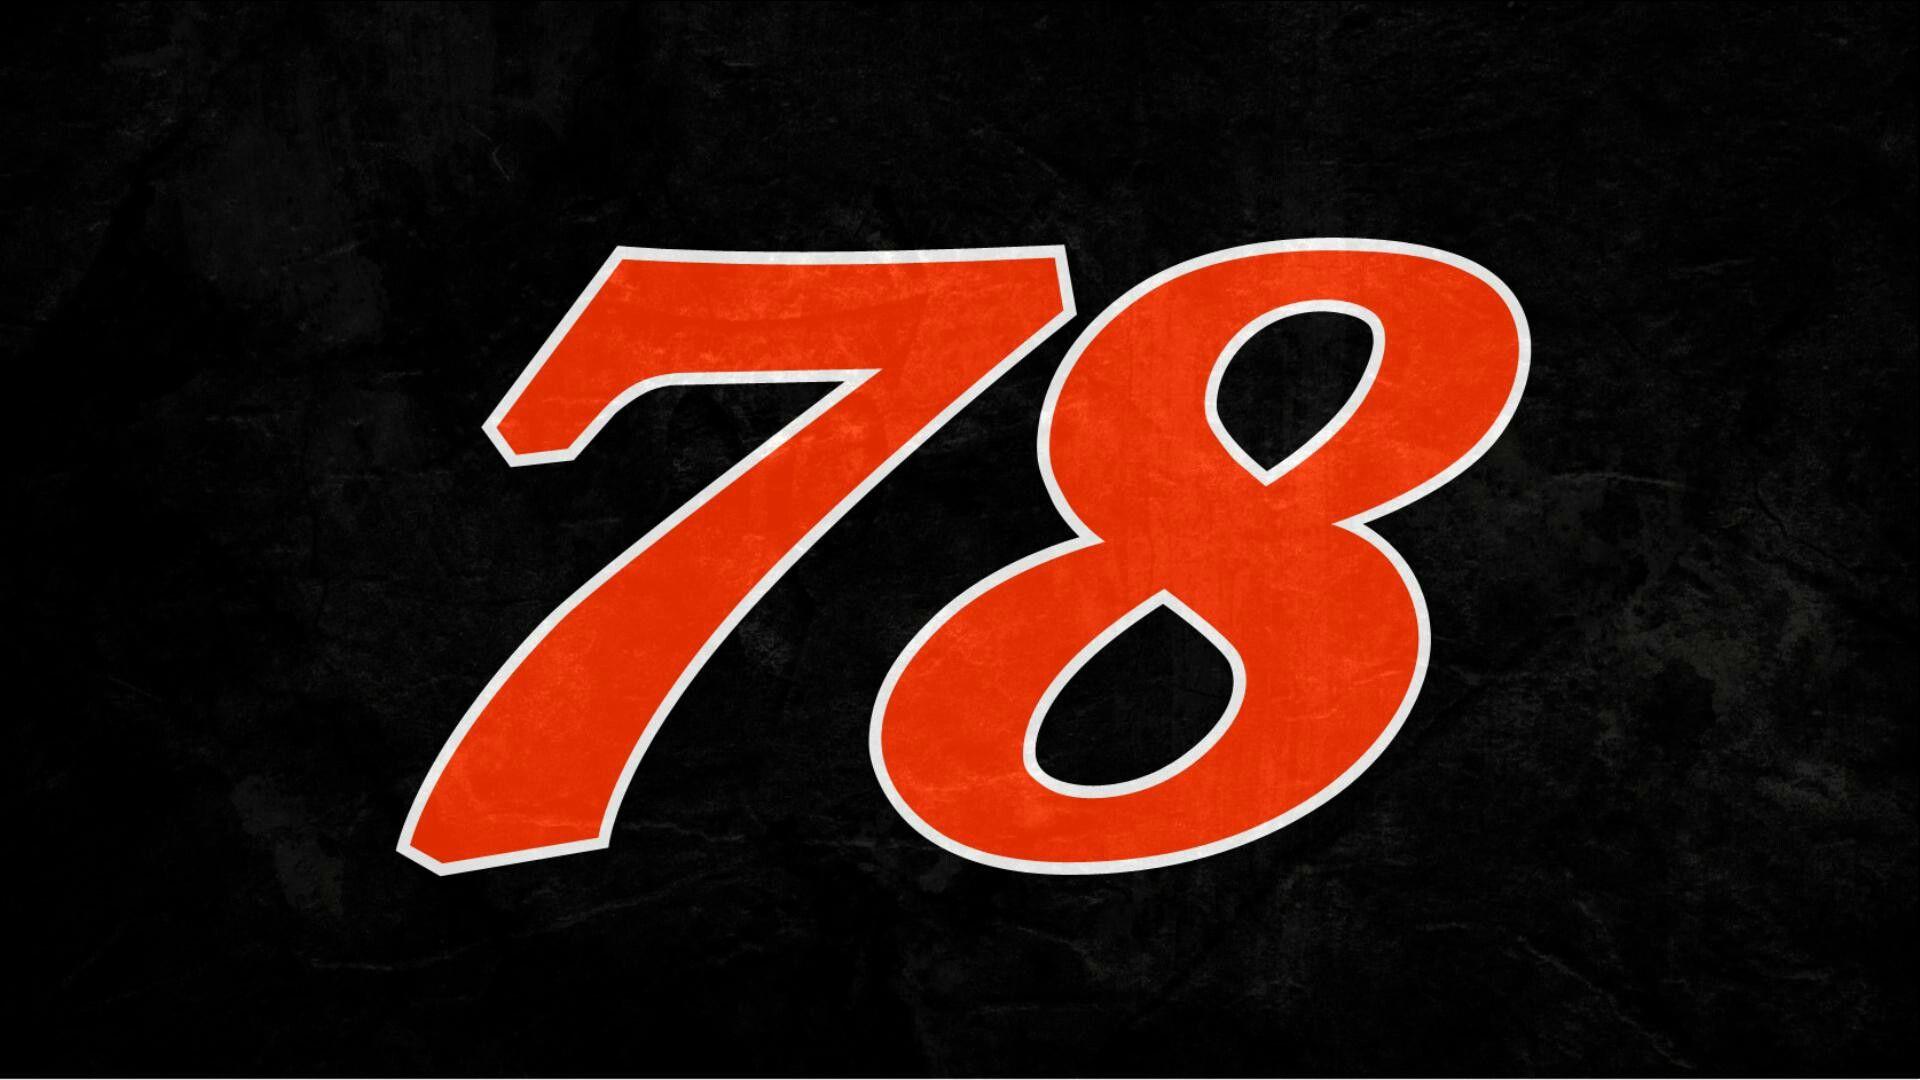 martin truex jr 78